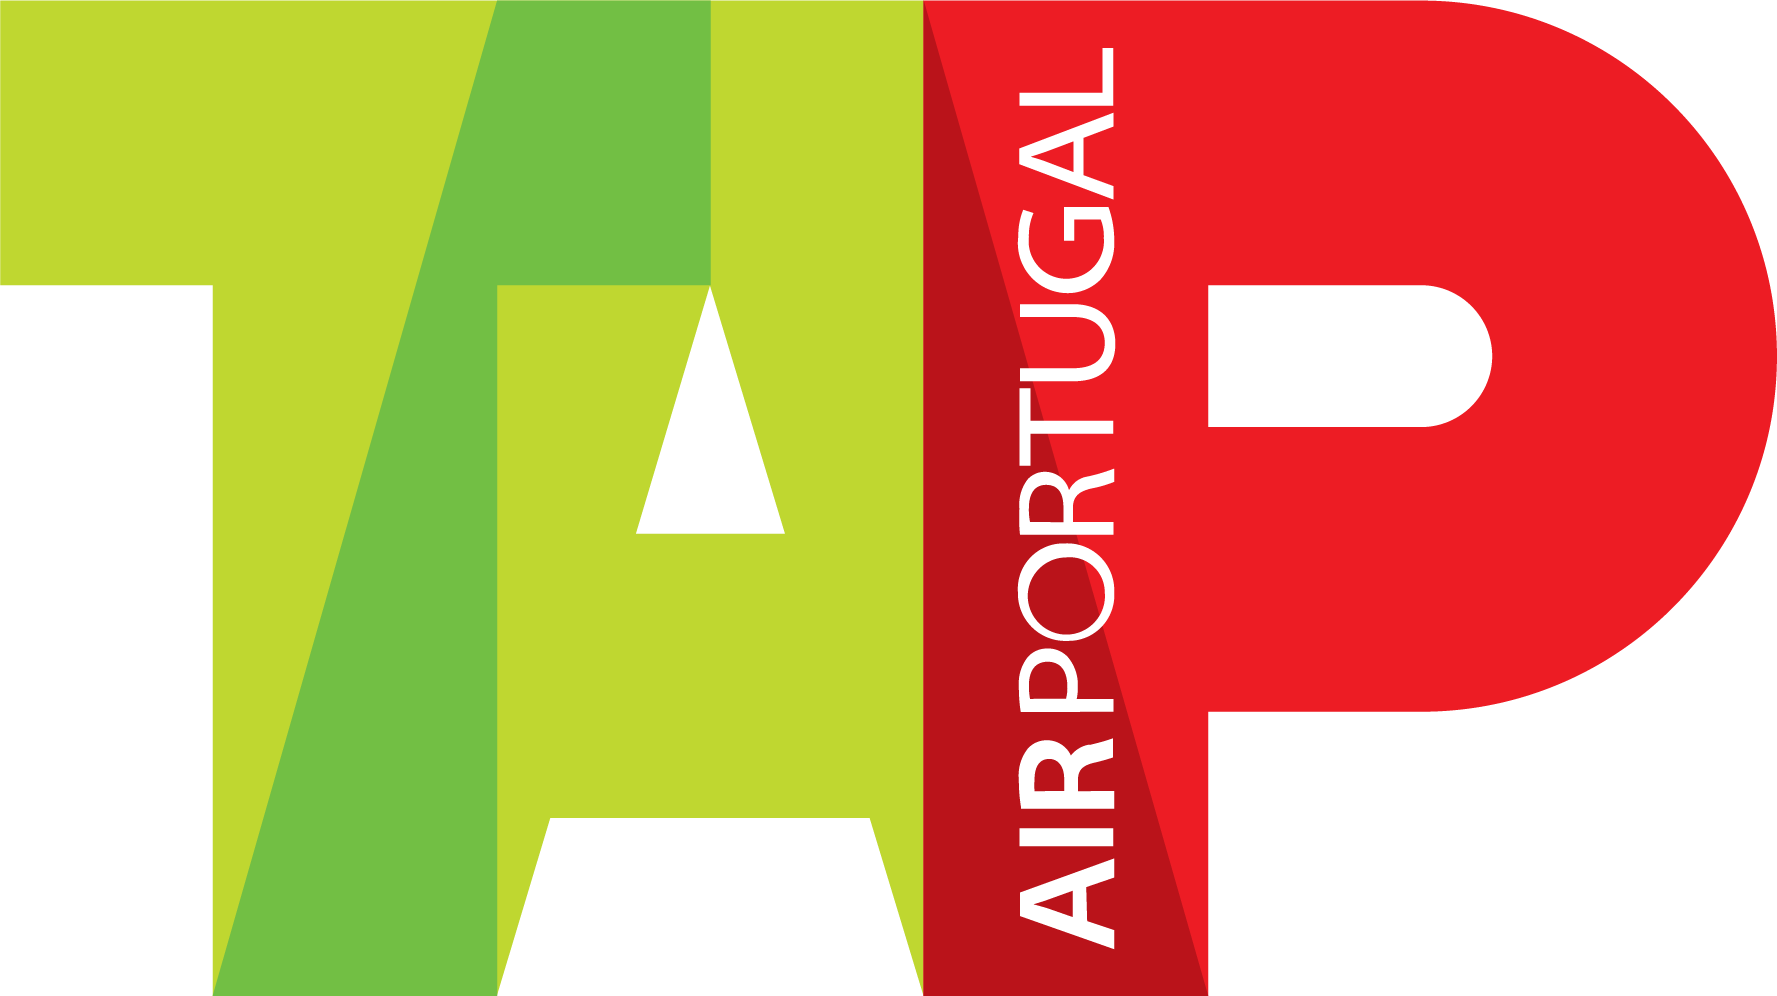 TAP - แอร์ปอร์ตูกัล